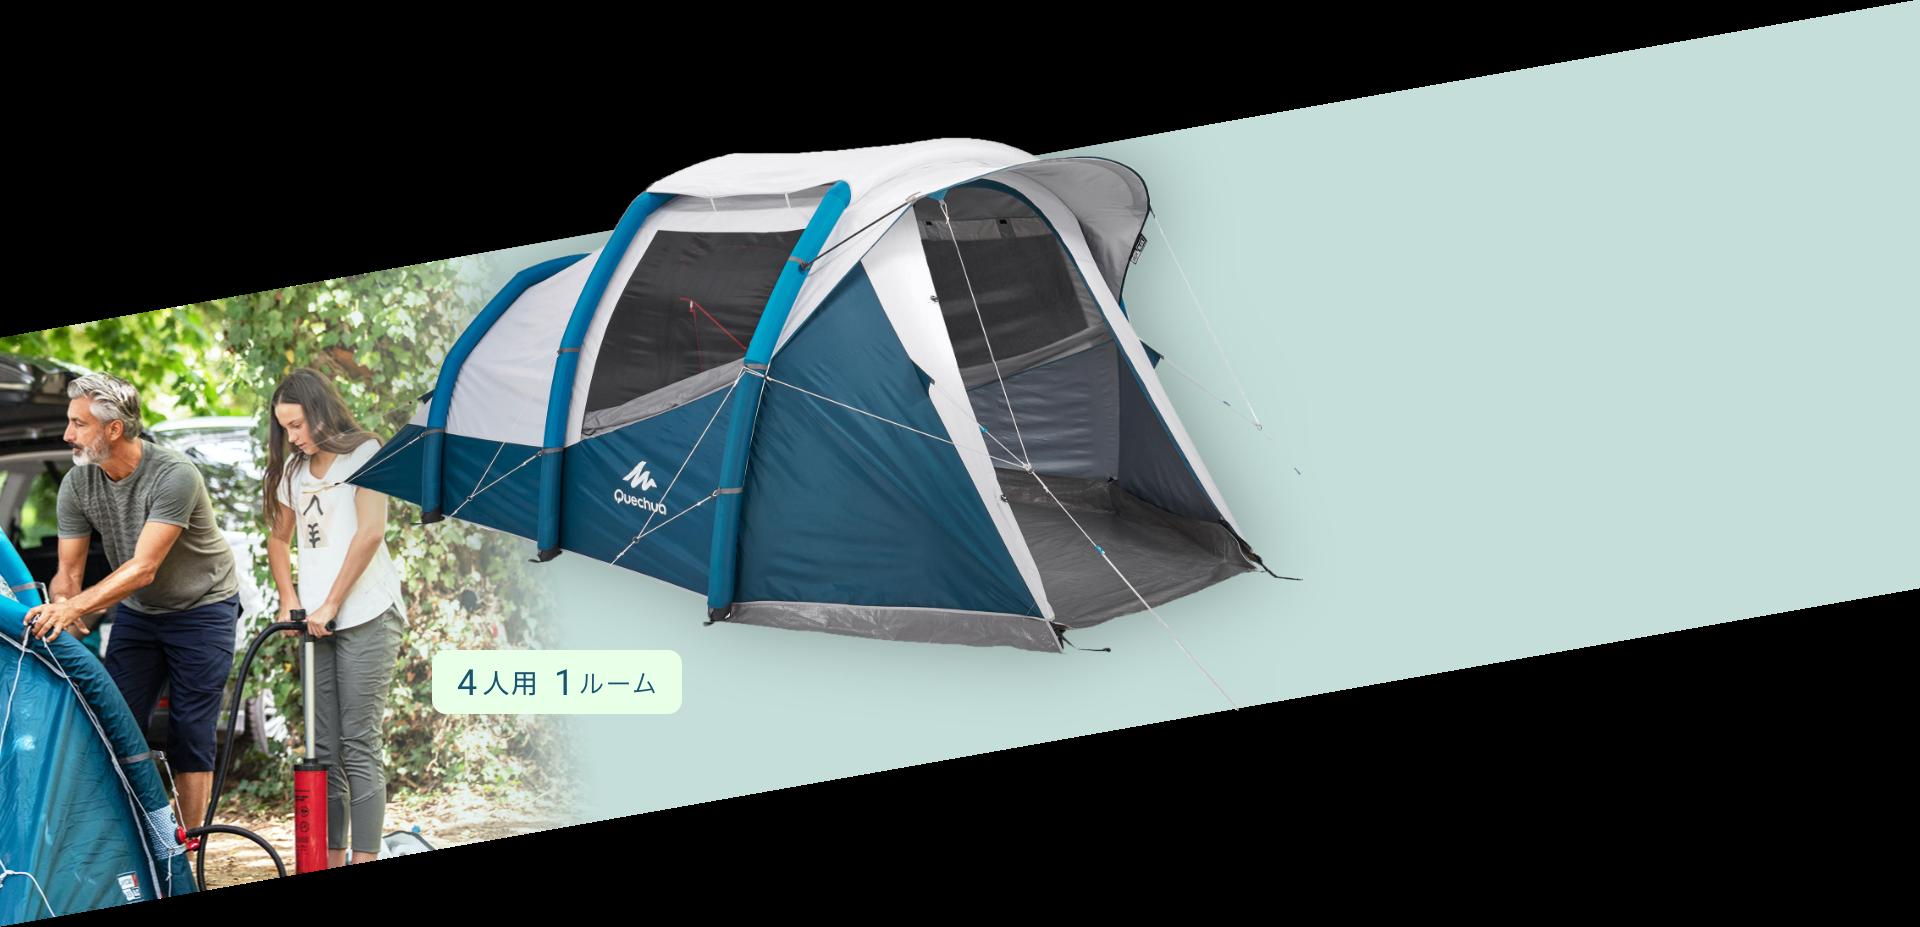 QUECHUA (ケシュア) キャンプ ファミリーテント エアーテント AIR SECONDS 4.1 FRESH&BLACK - 4人用 1ルーム